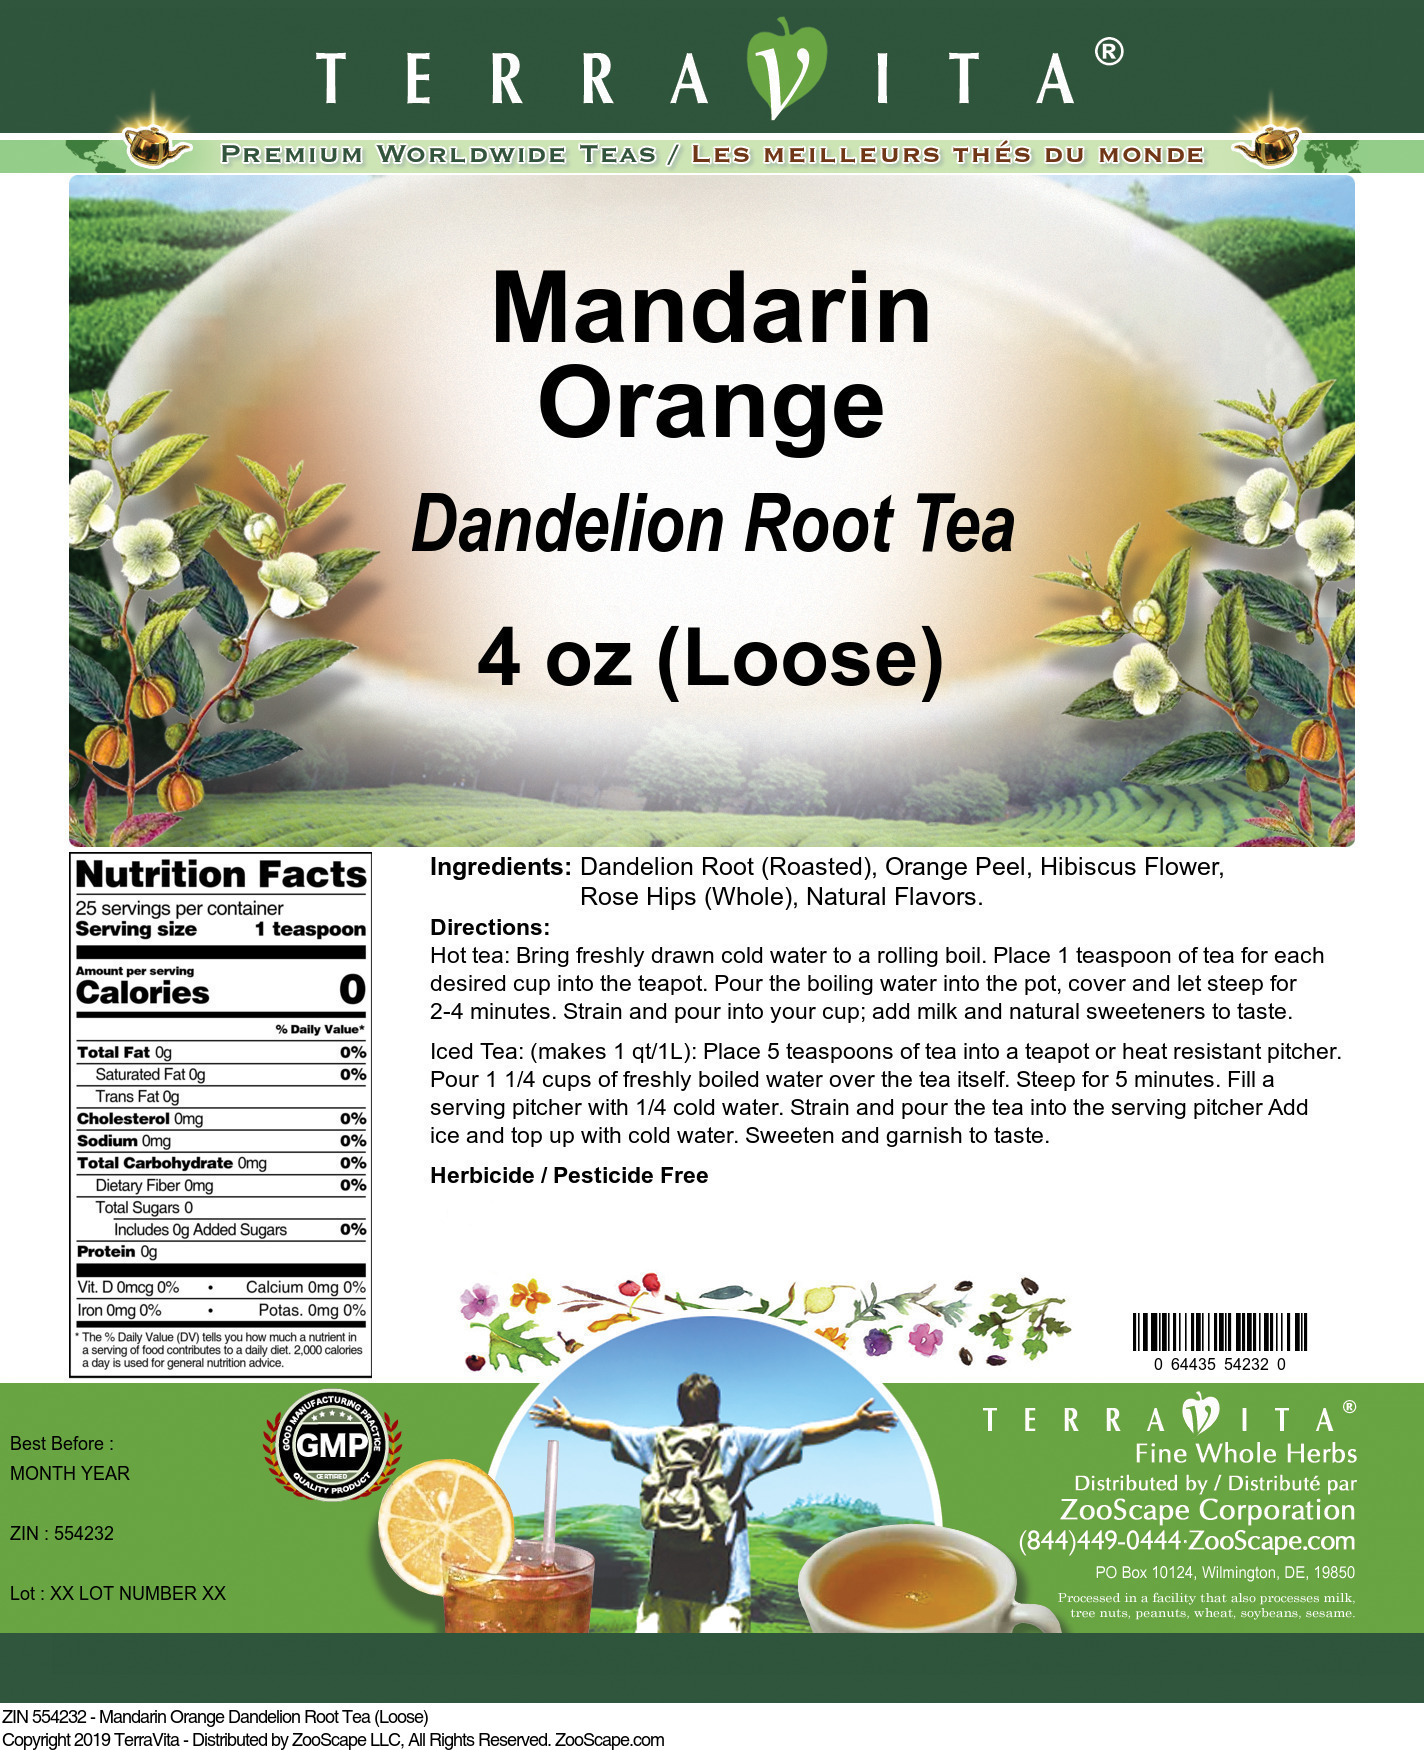 Mandarin Orange Dandelion Root